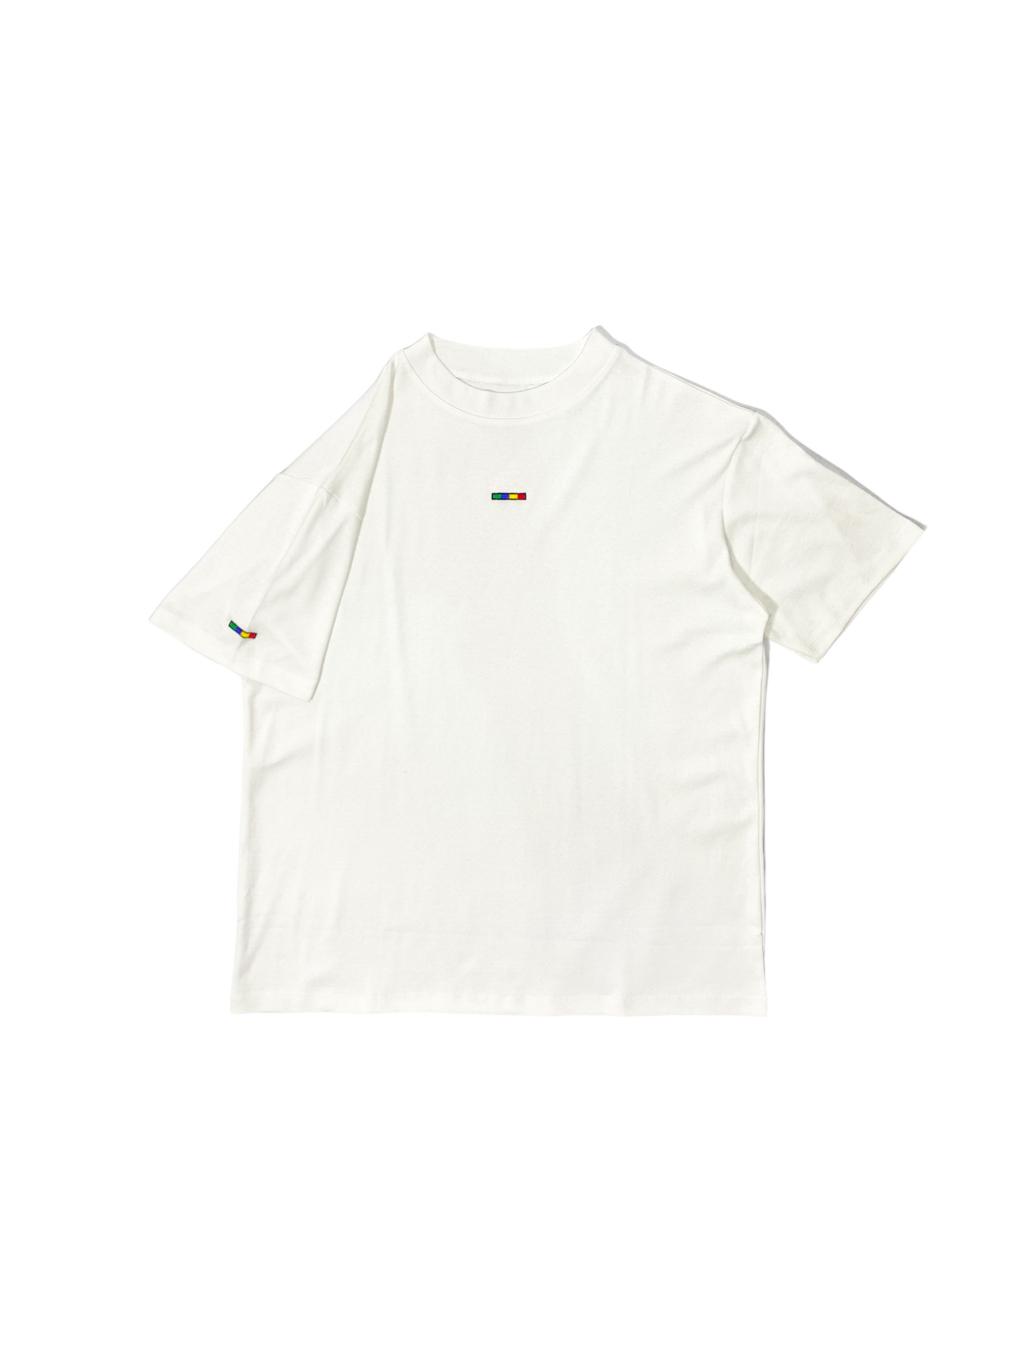 Surway Logo T- Shirt (White)